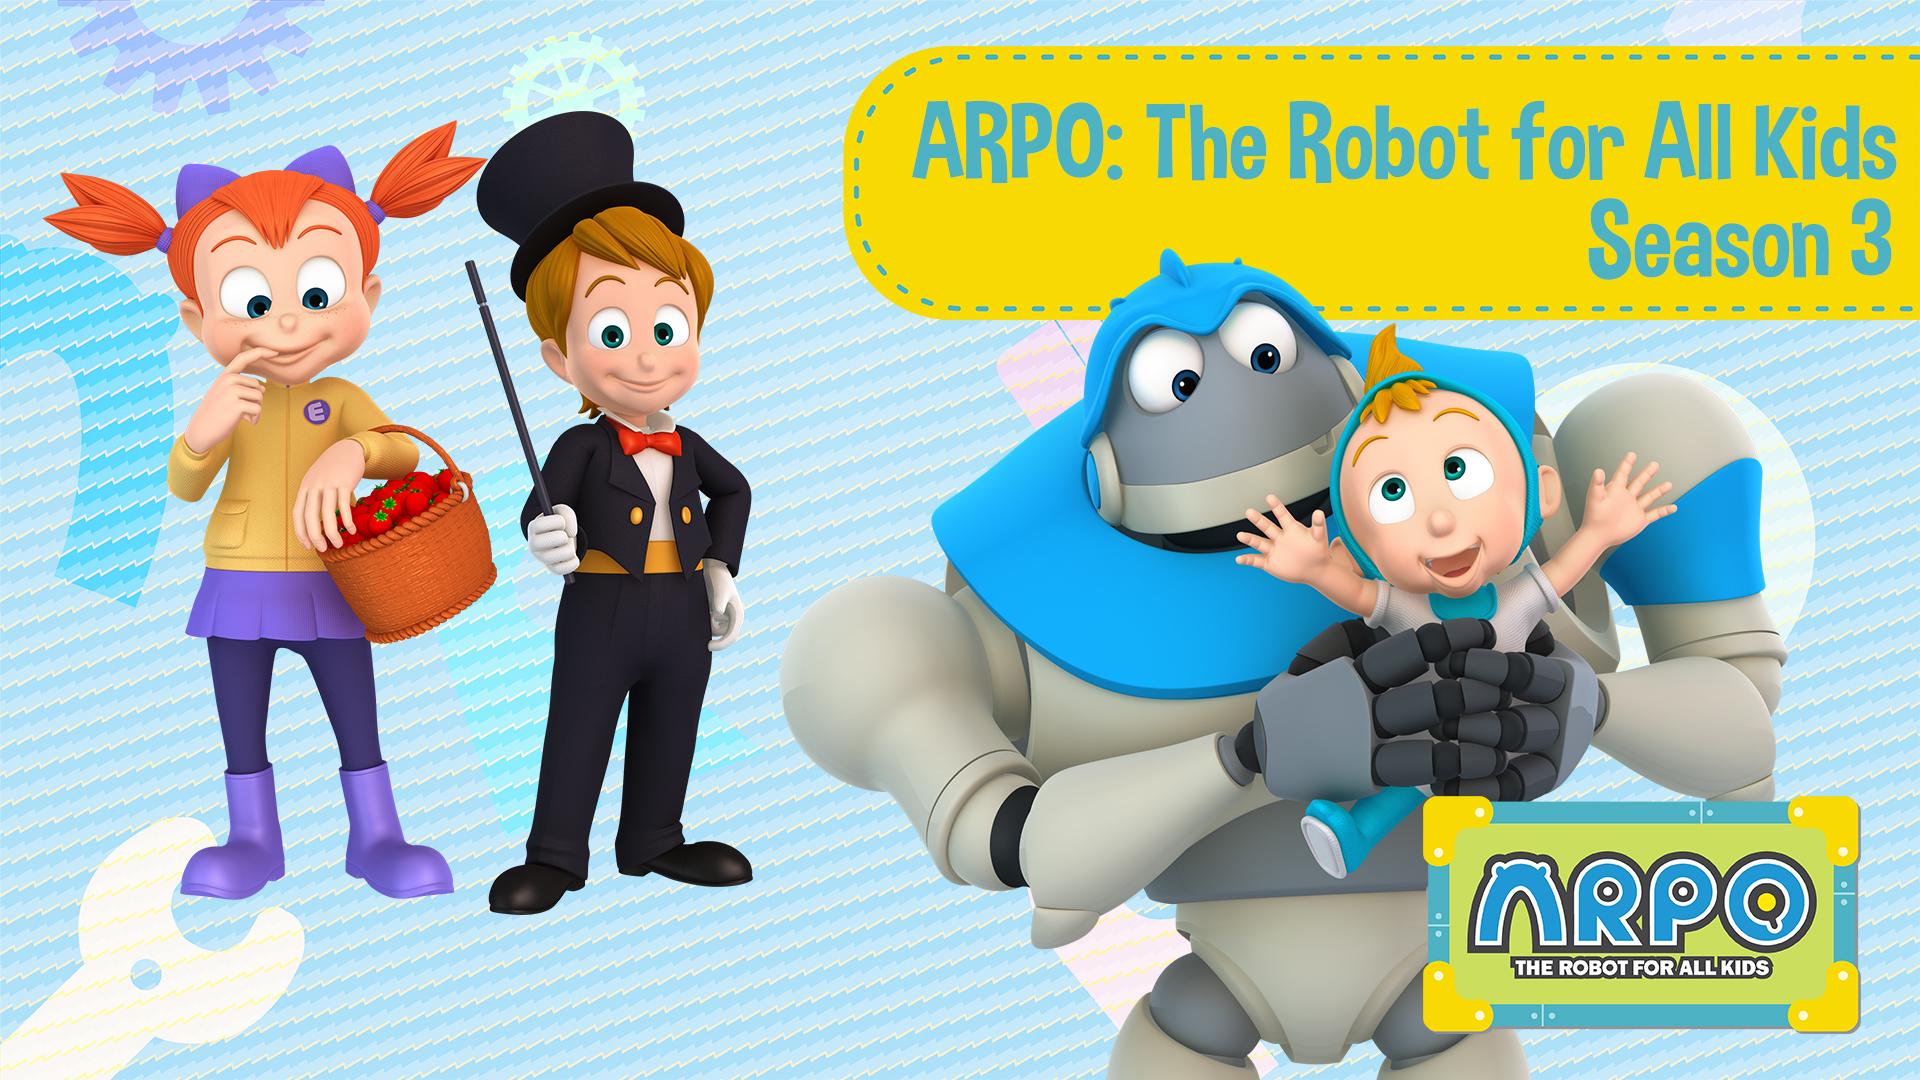 Arpo: The Robot for All Kids - Season 3